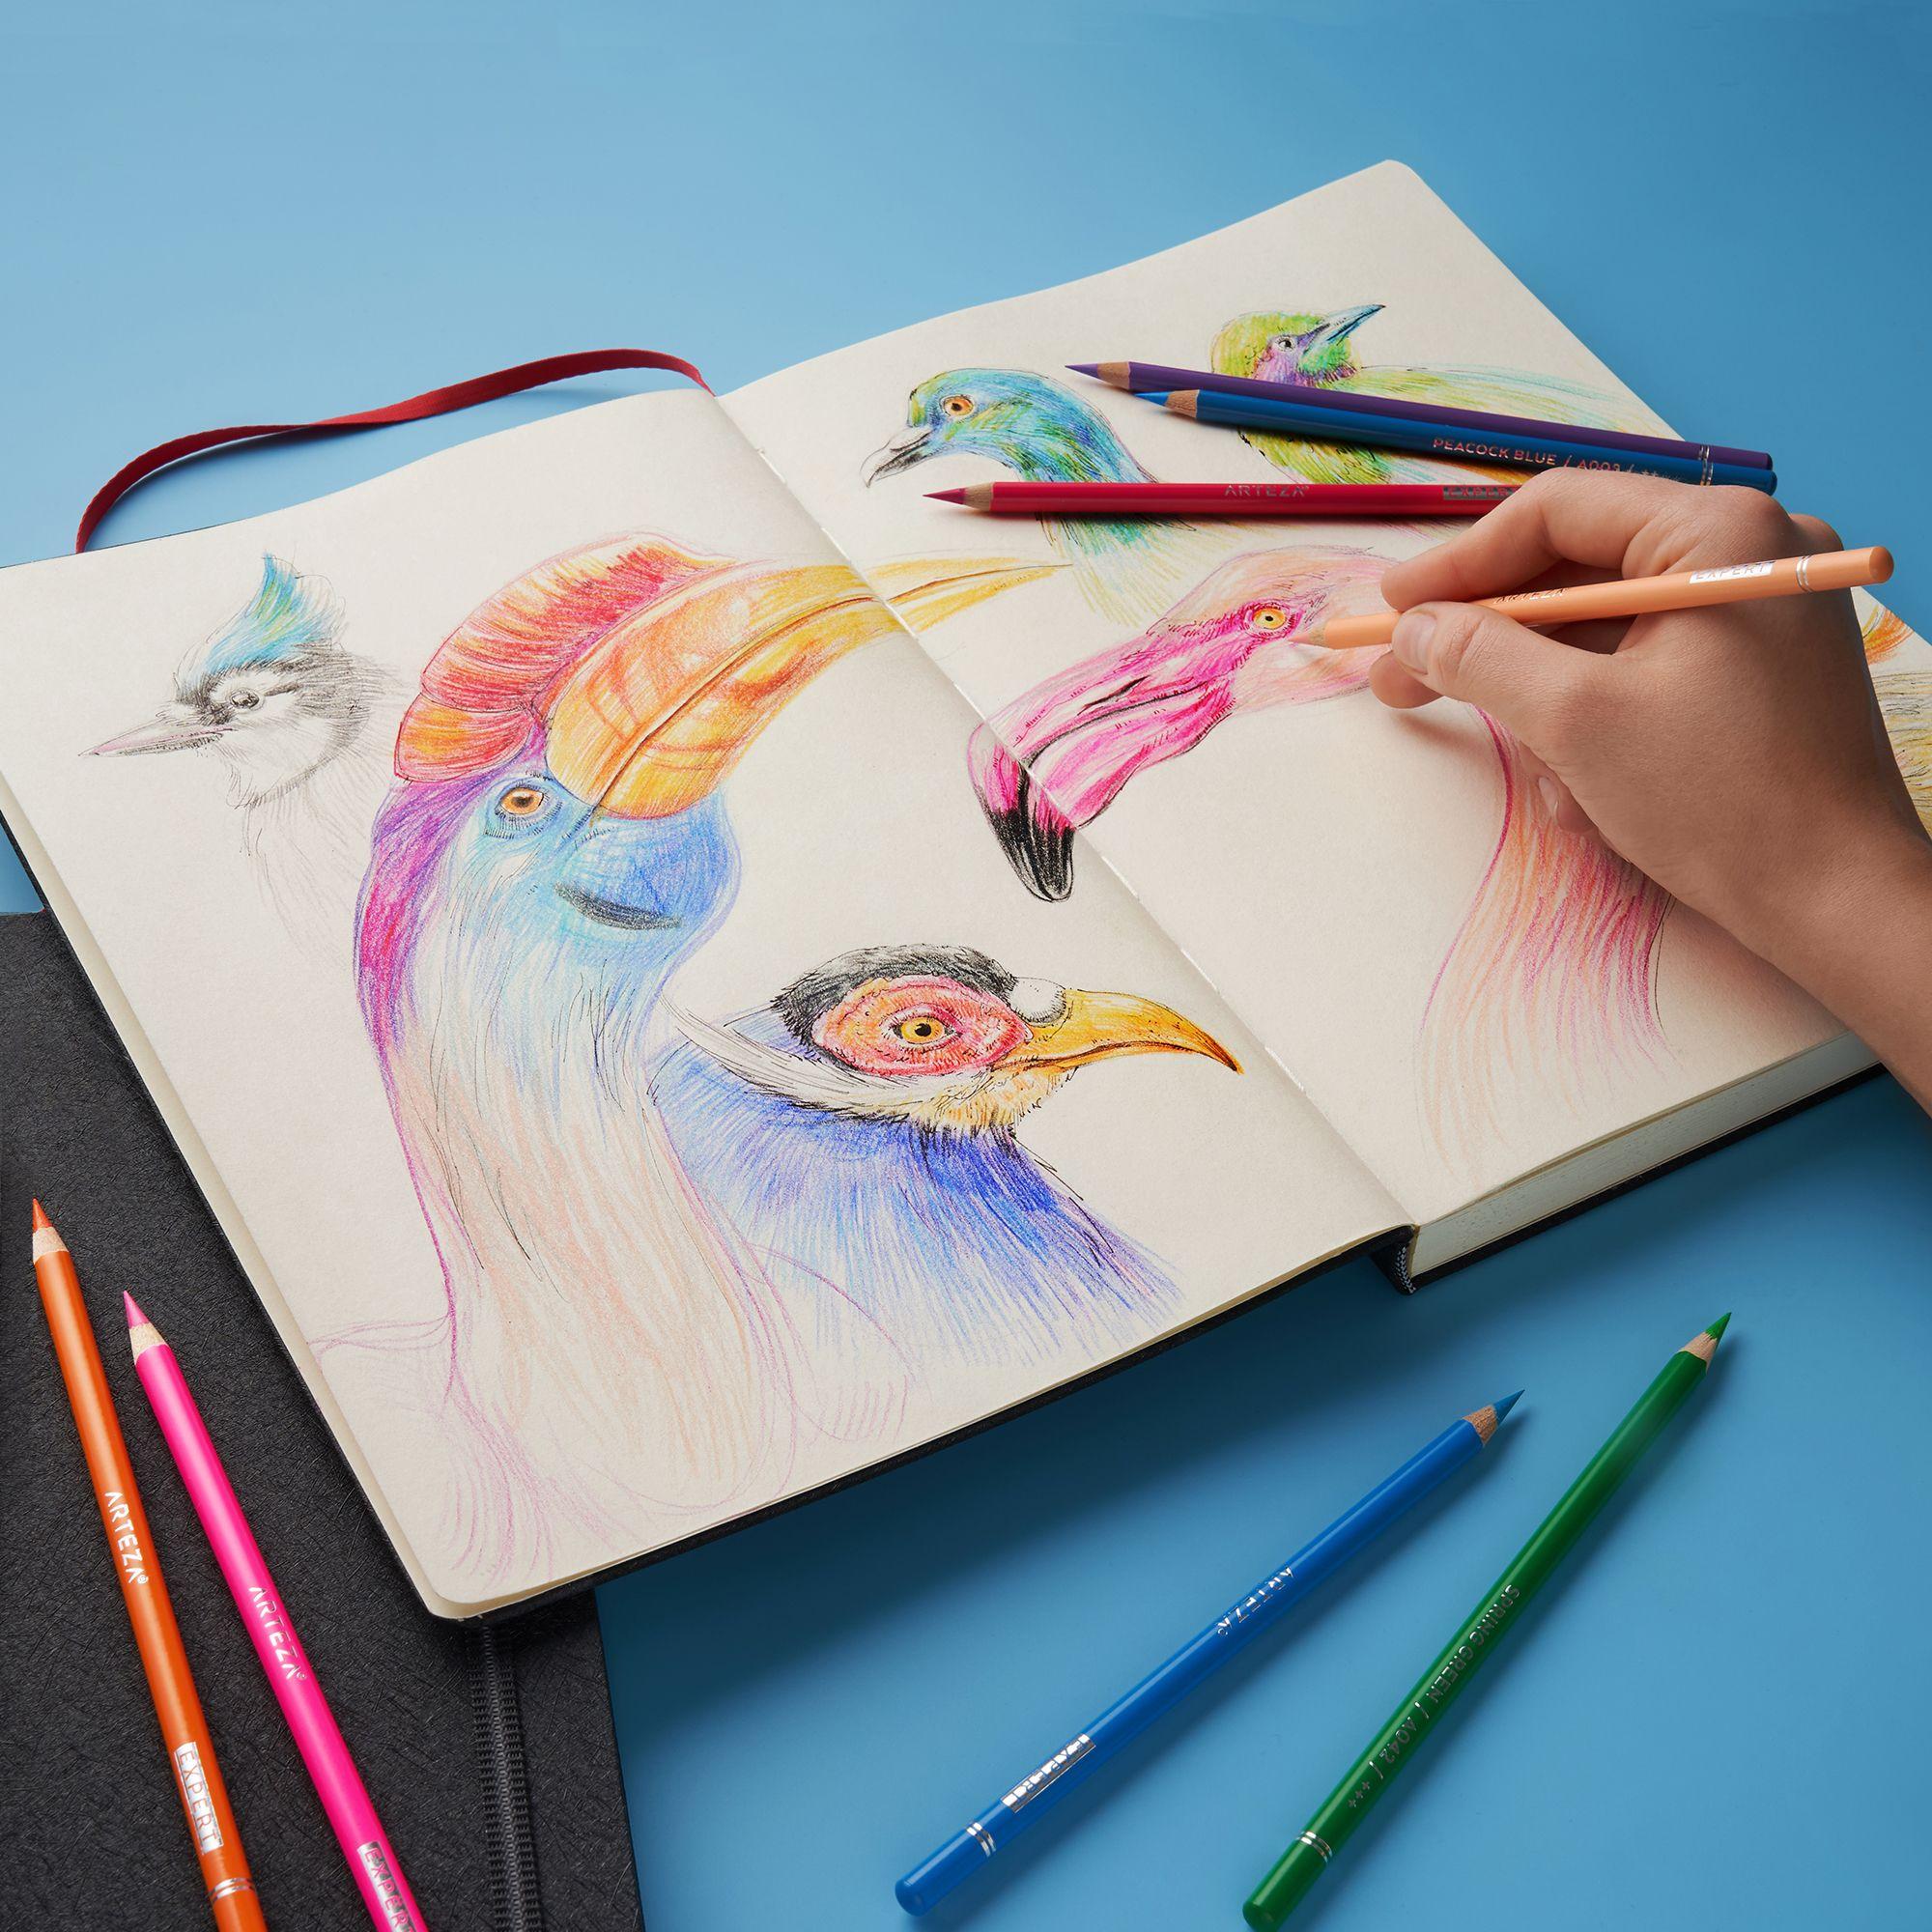 Professional Watercolor Pencils Set Of 72 Watercolor Pencils